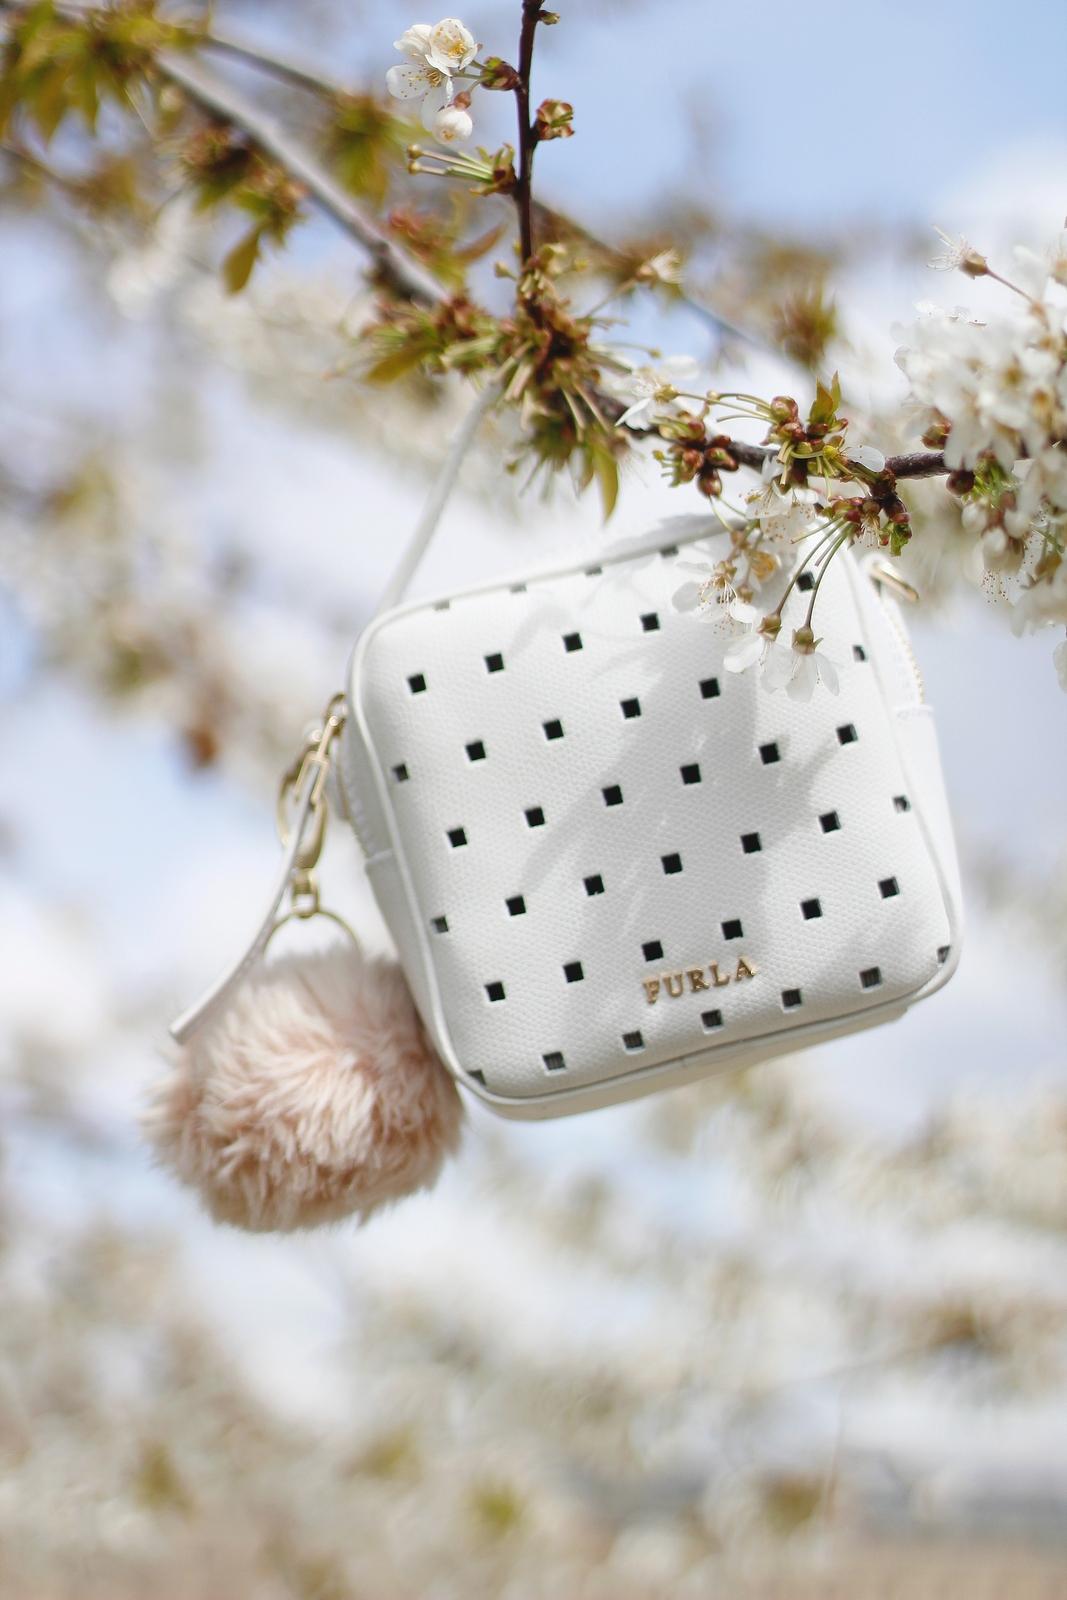 Blog mode femme Paris - Du style, Madame - Streetstyle - furla